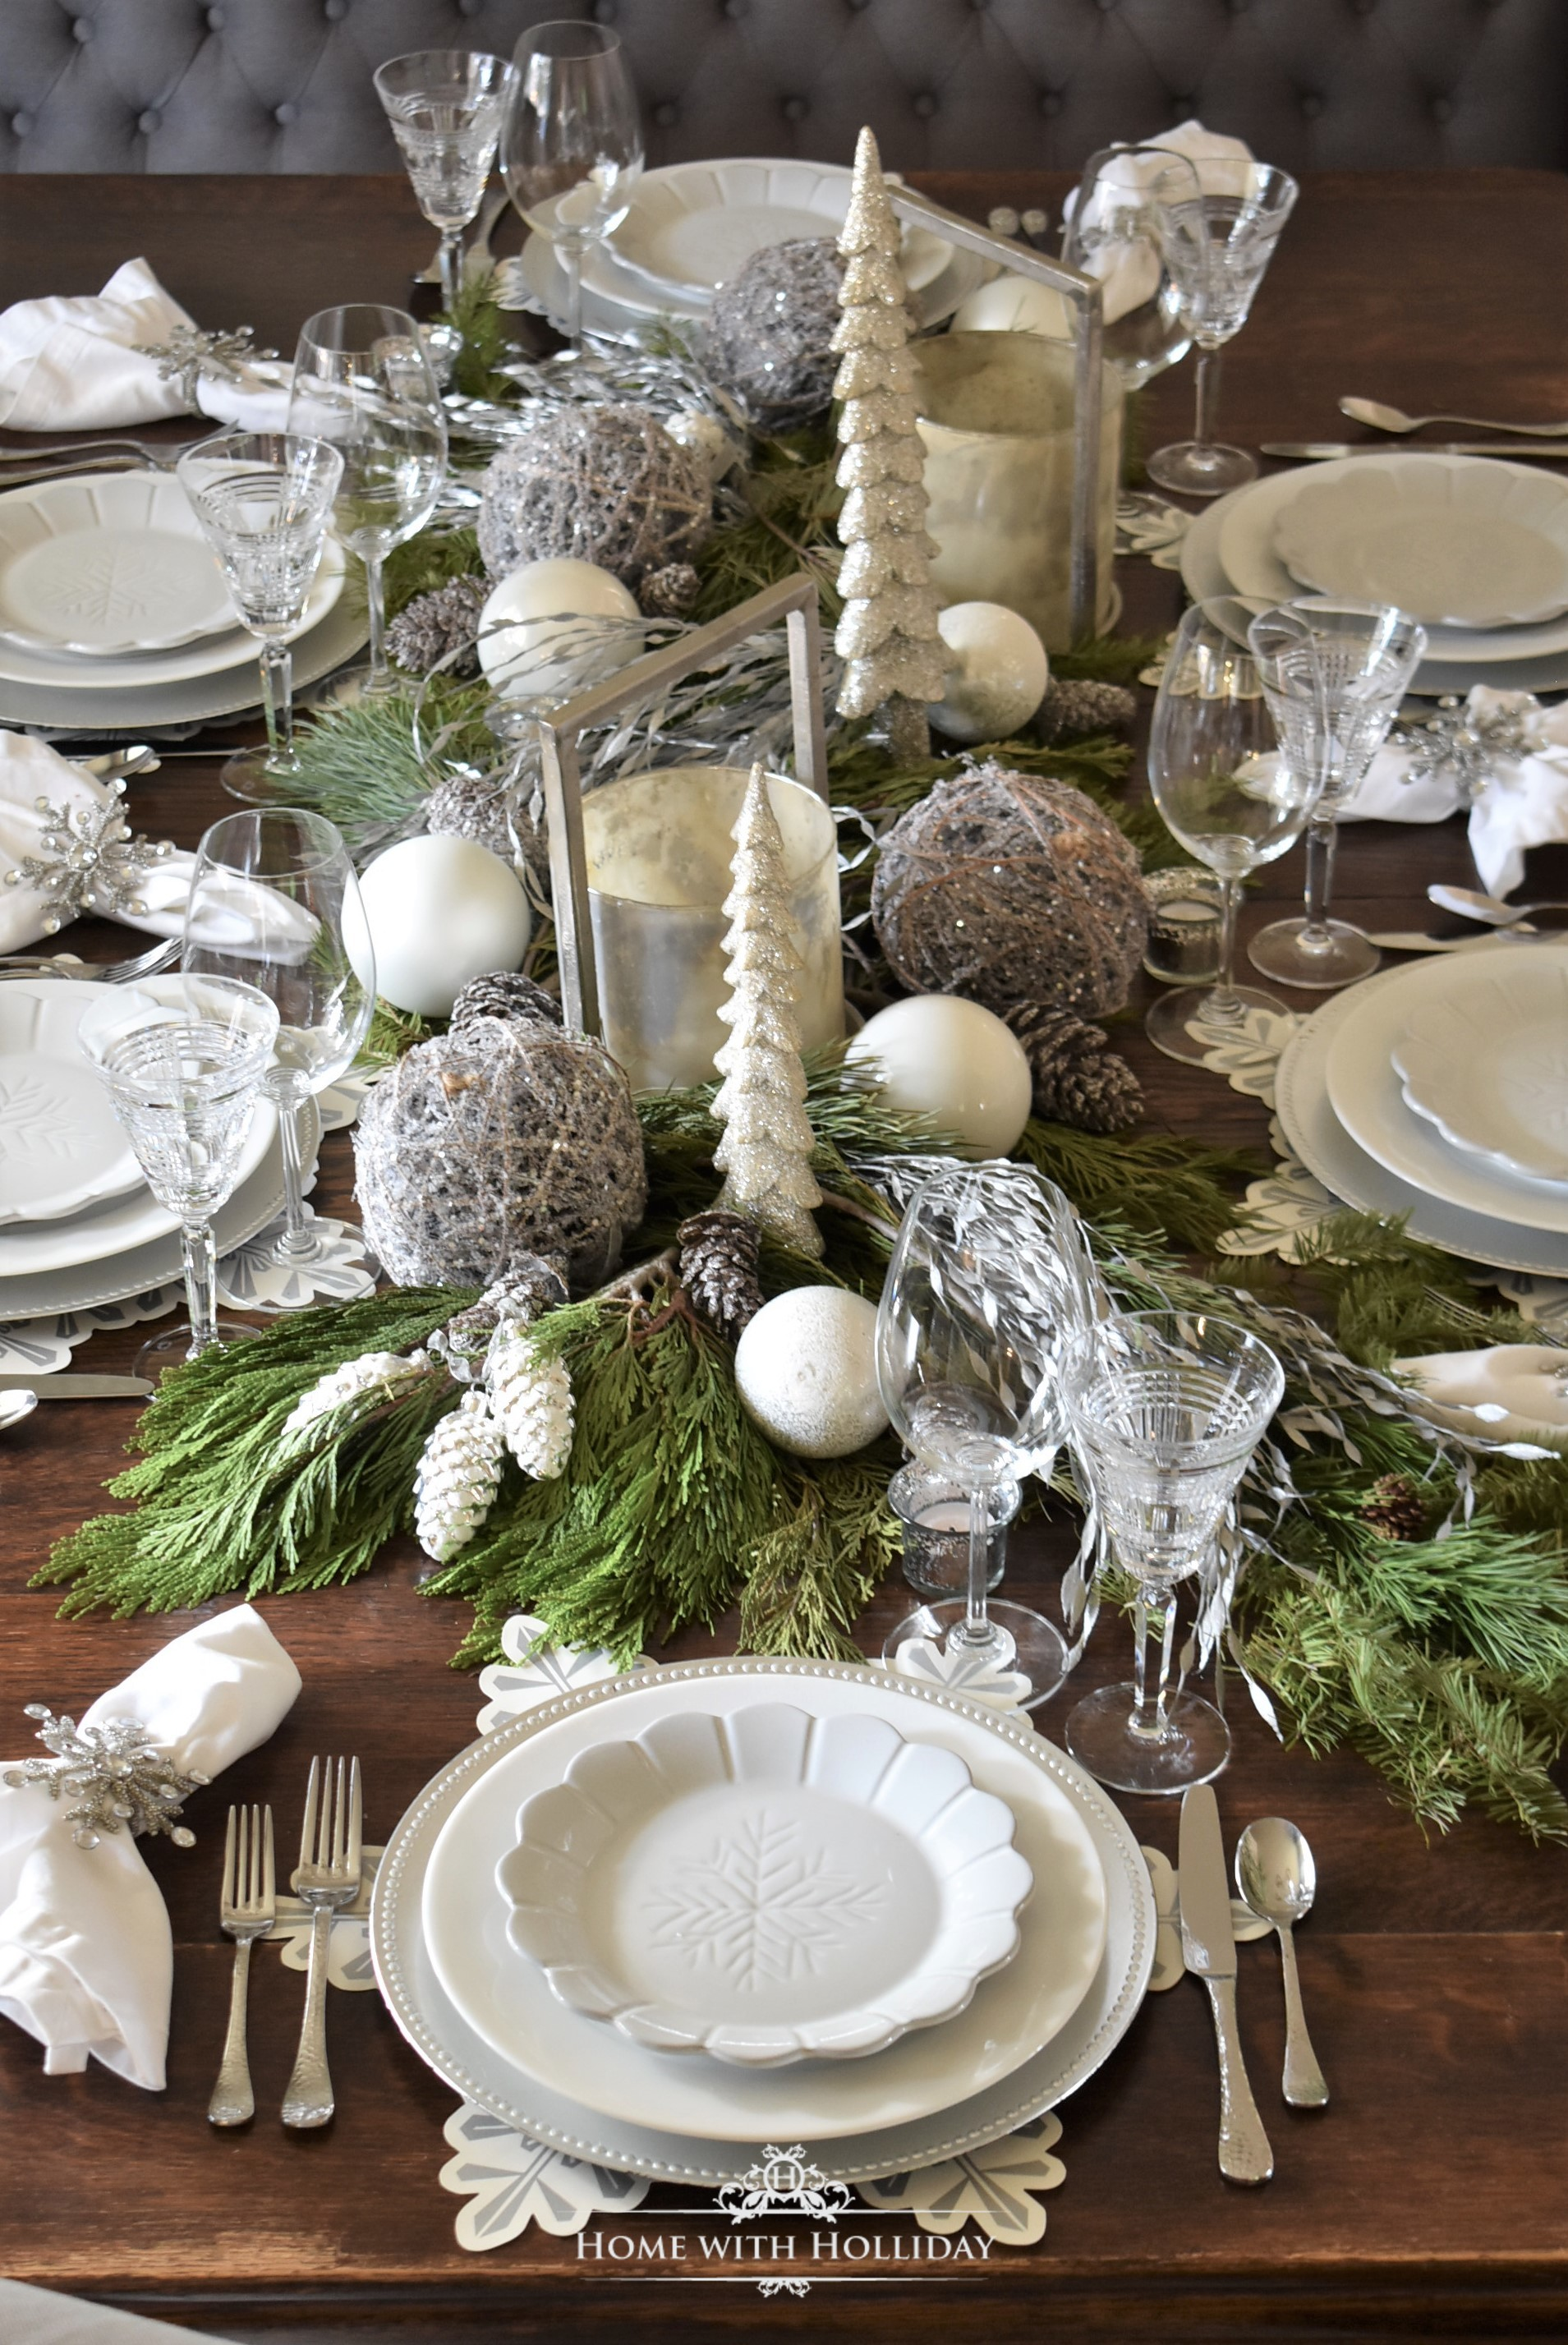 My Christmas Home Tour - Winter White Snowflake Christmas Table Setting - Home with Holliday